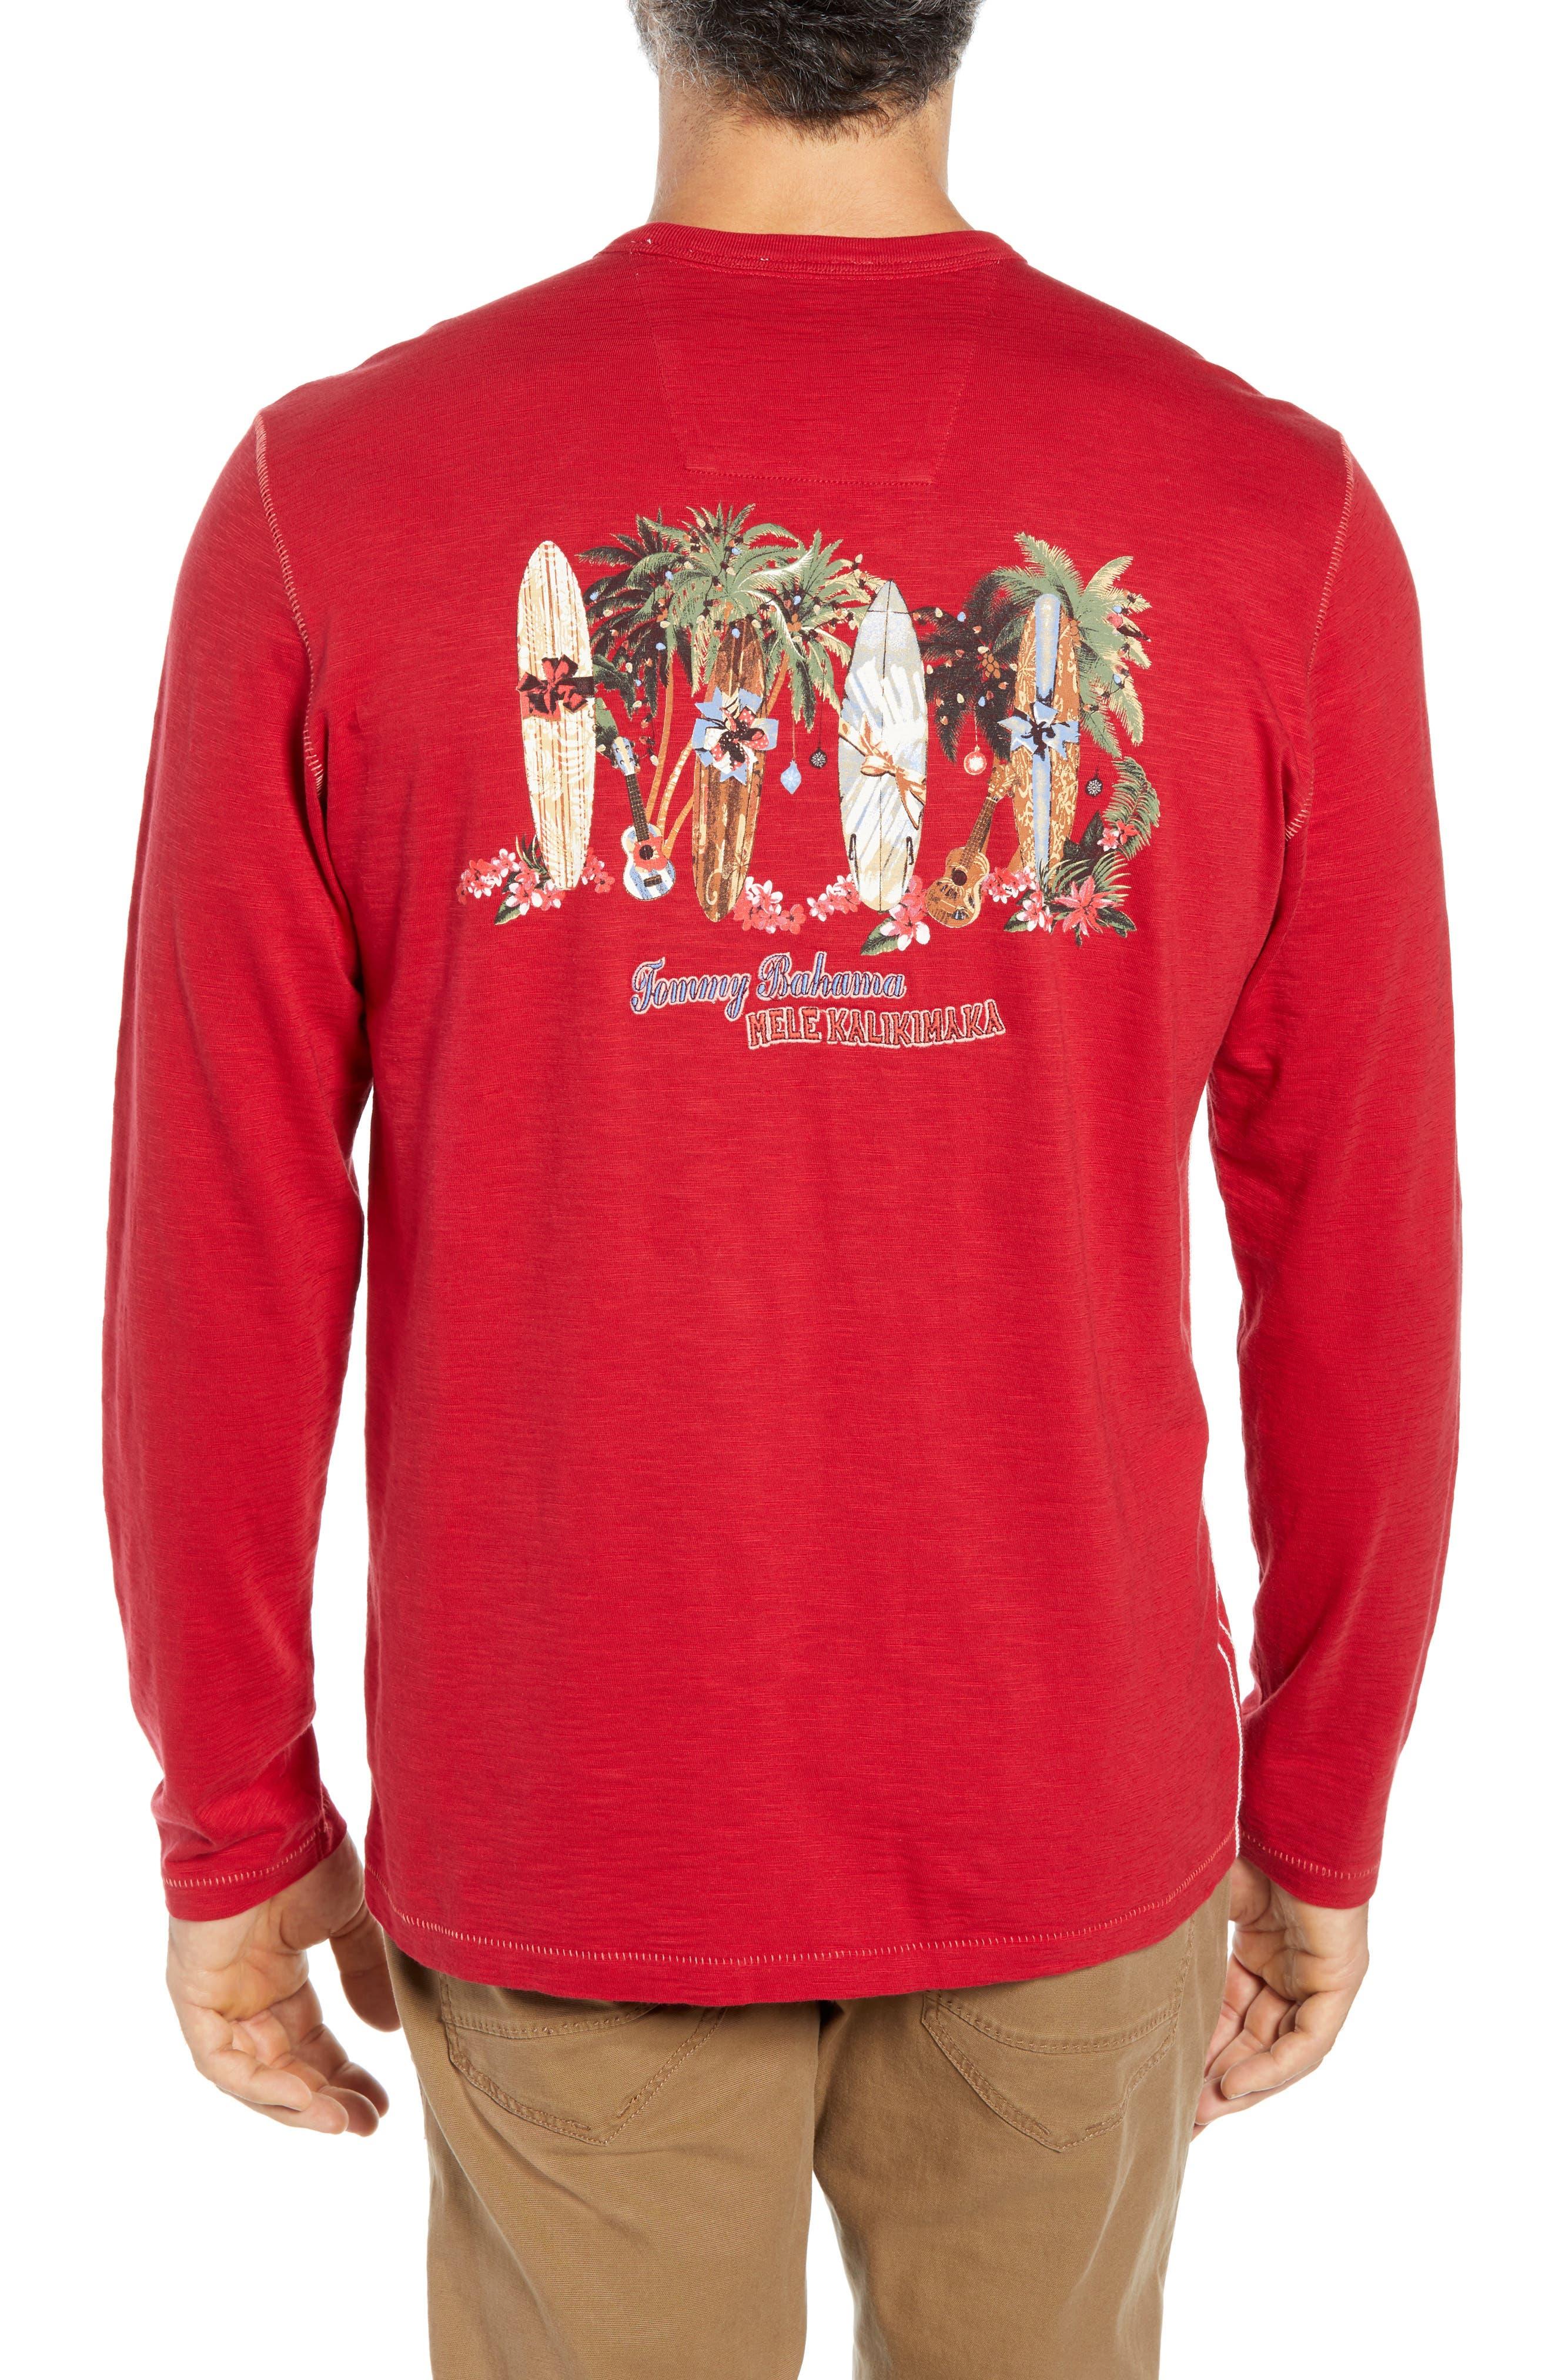 Mele Kalikimaka T-Shirt,                             Alternate thumbnail 2, color,                             SCOOTER RED